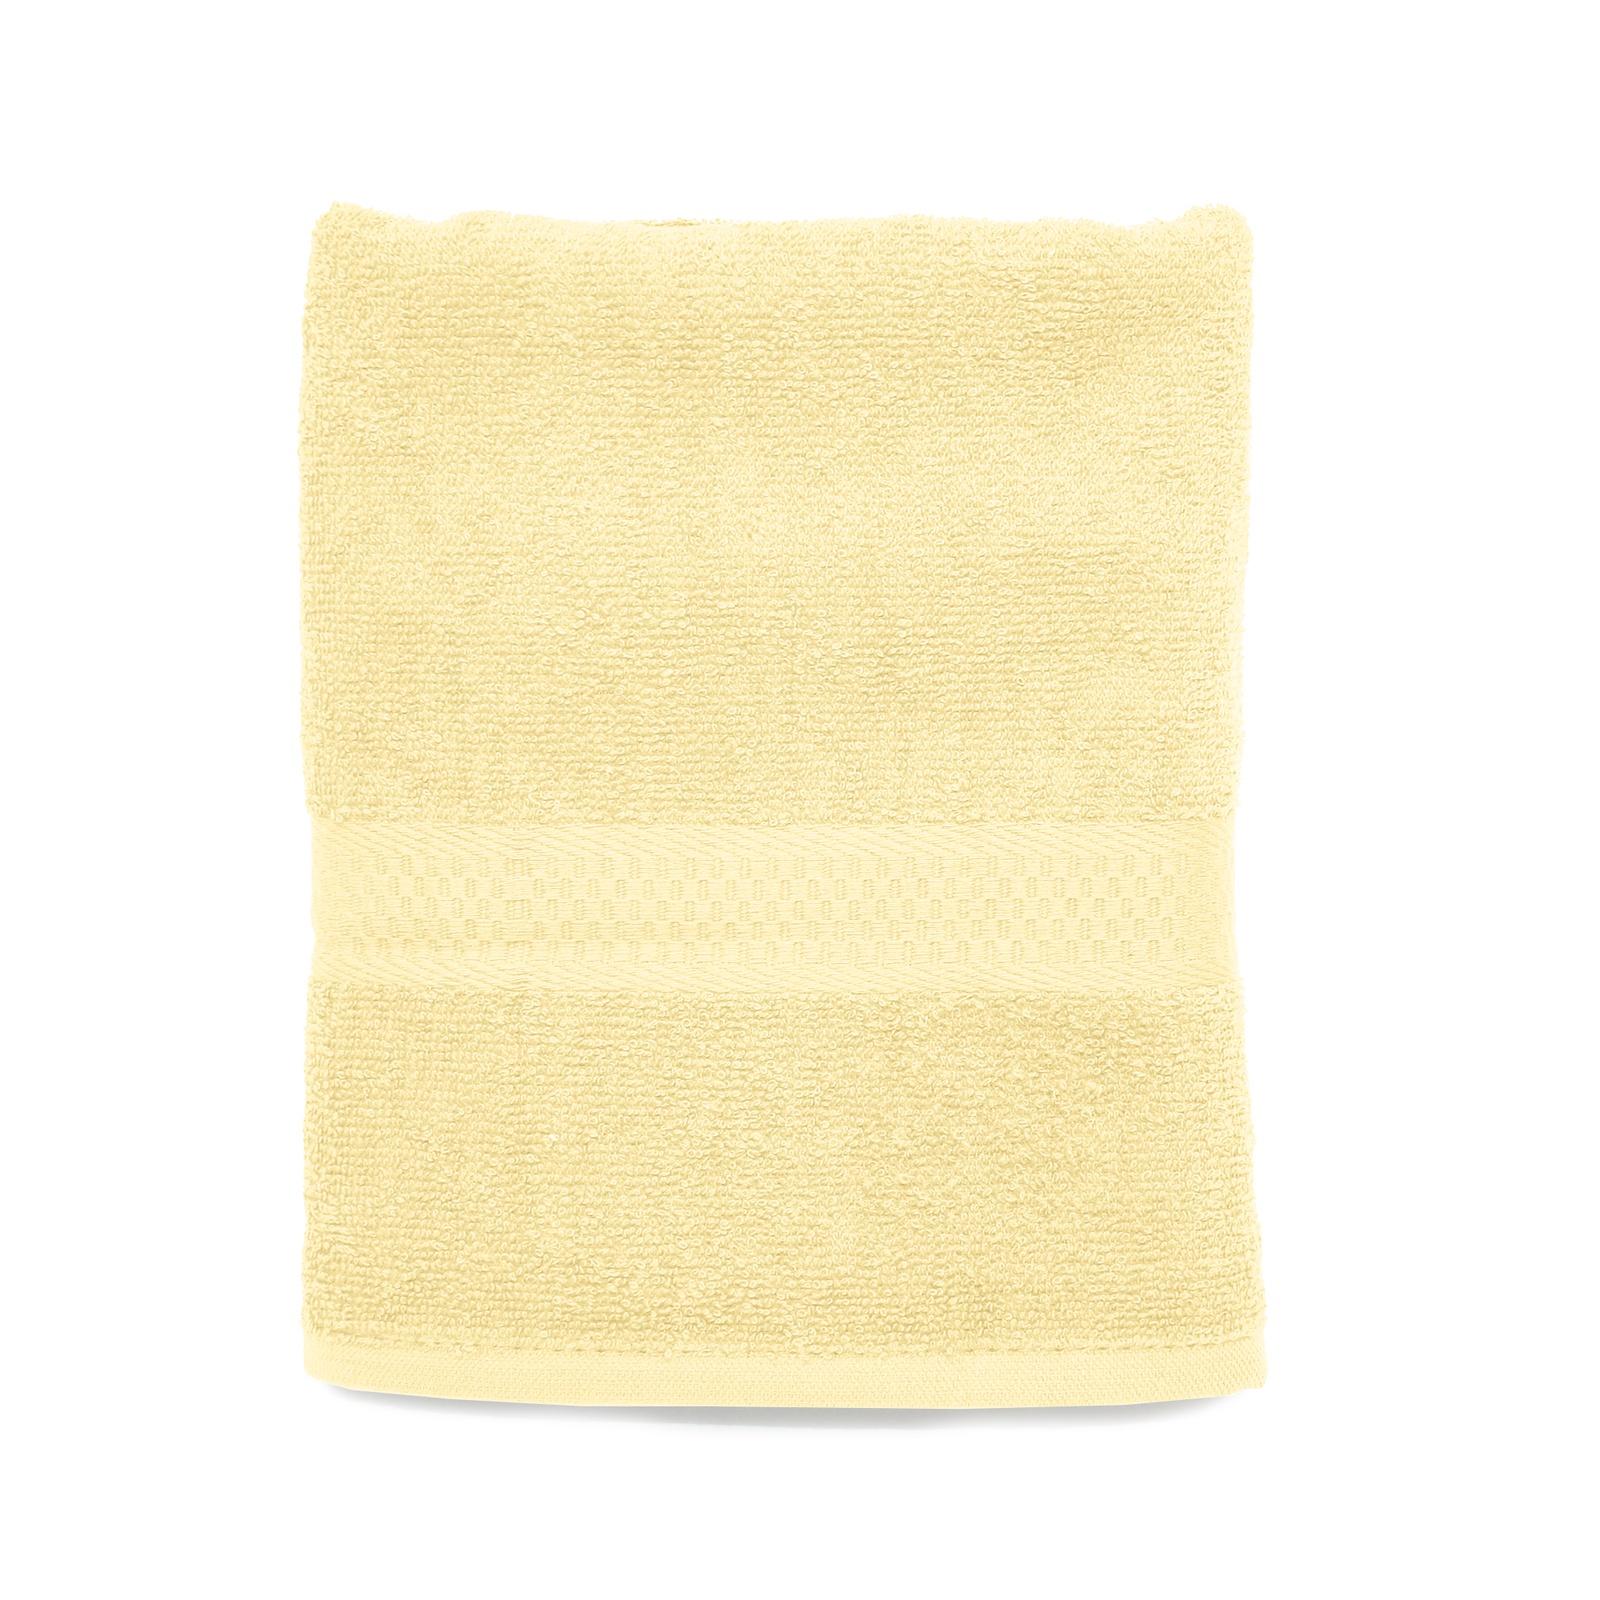 Полотенце банное Spany, 21311318175, махровое, бежевый, 50 х 90 см полотенце банное mona liza orchid цвет белый 50 х 90 см